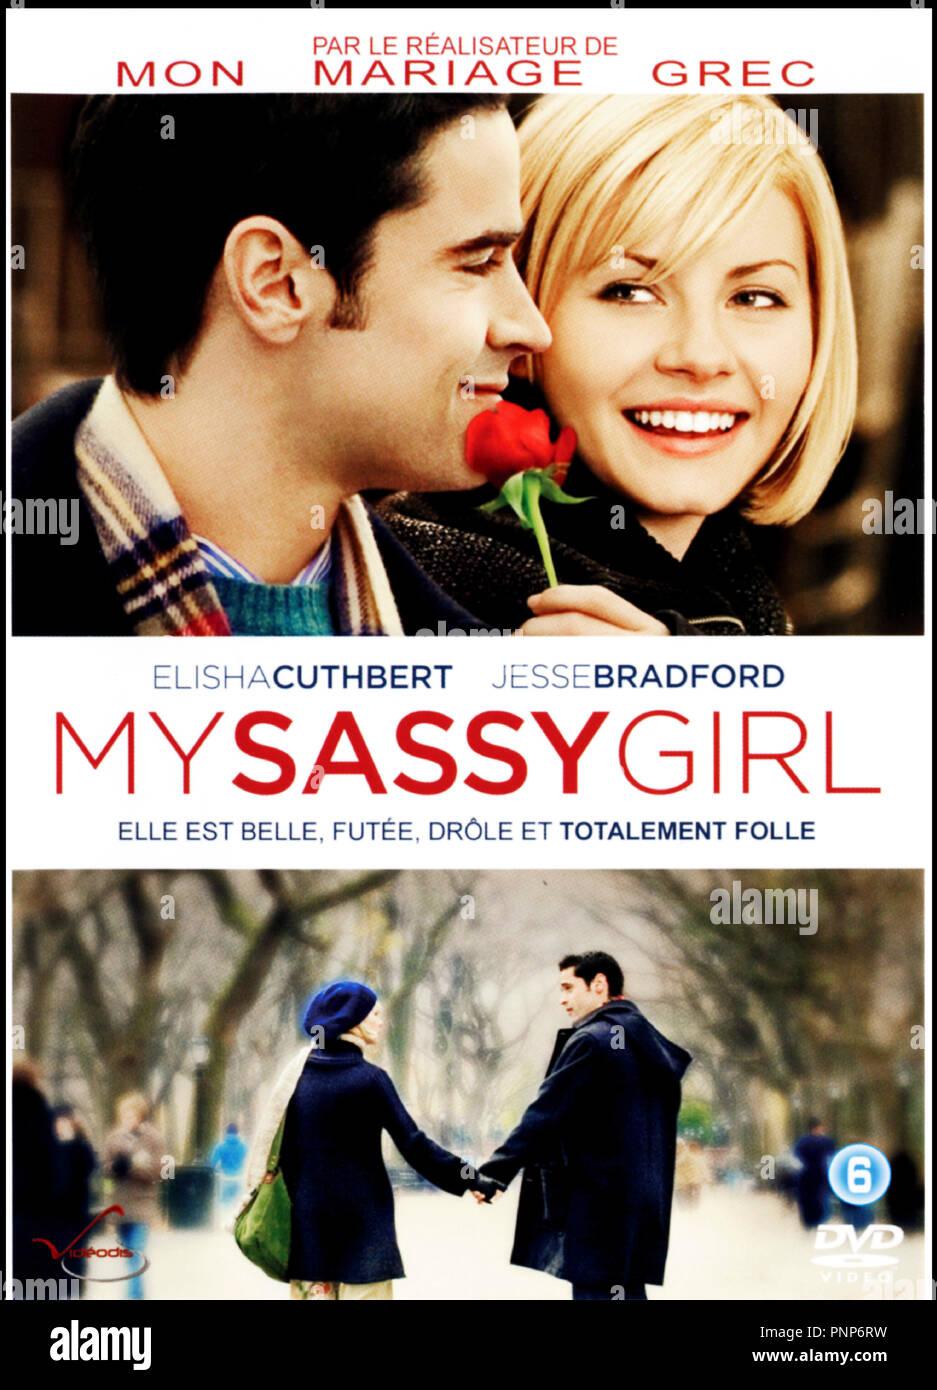 my sassy girl 2 full movie download